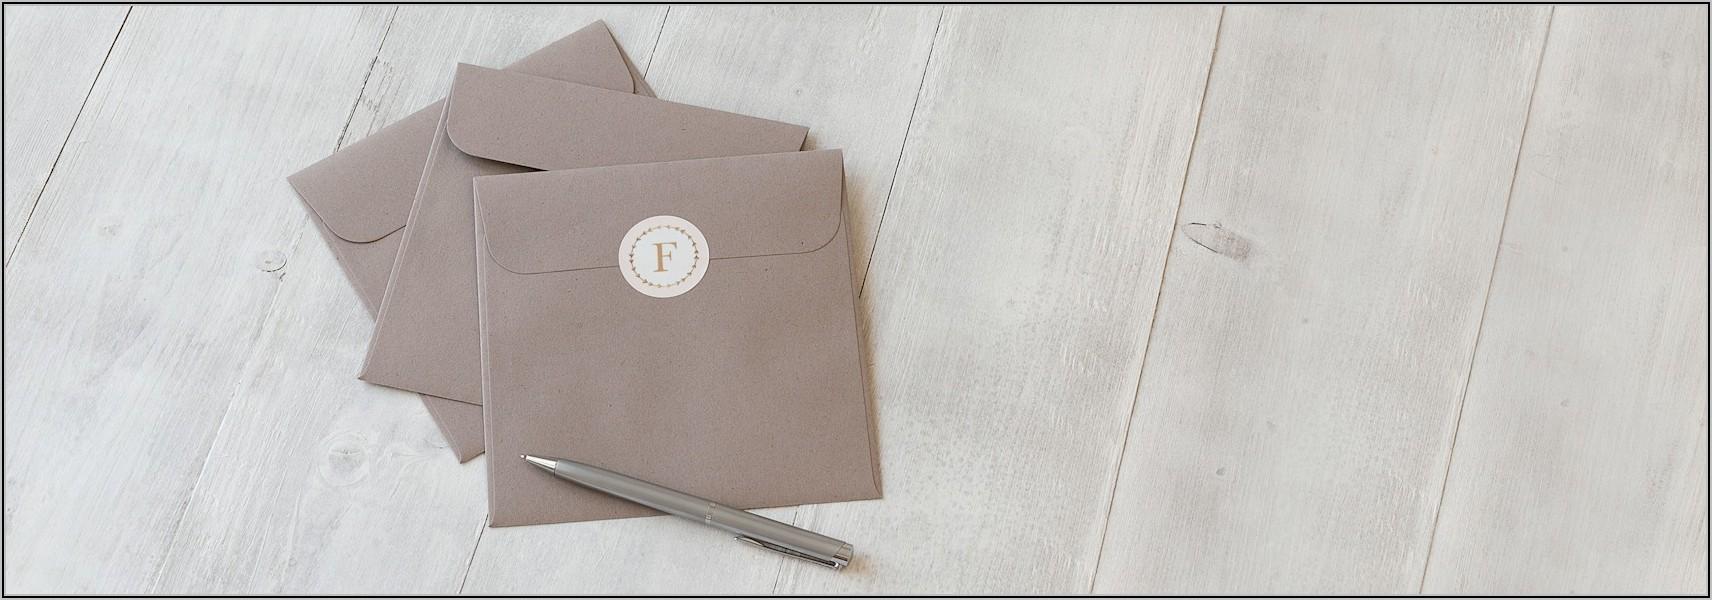 Vistaprint Envelope Seals Size